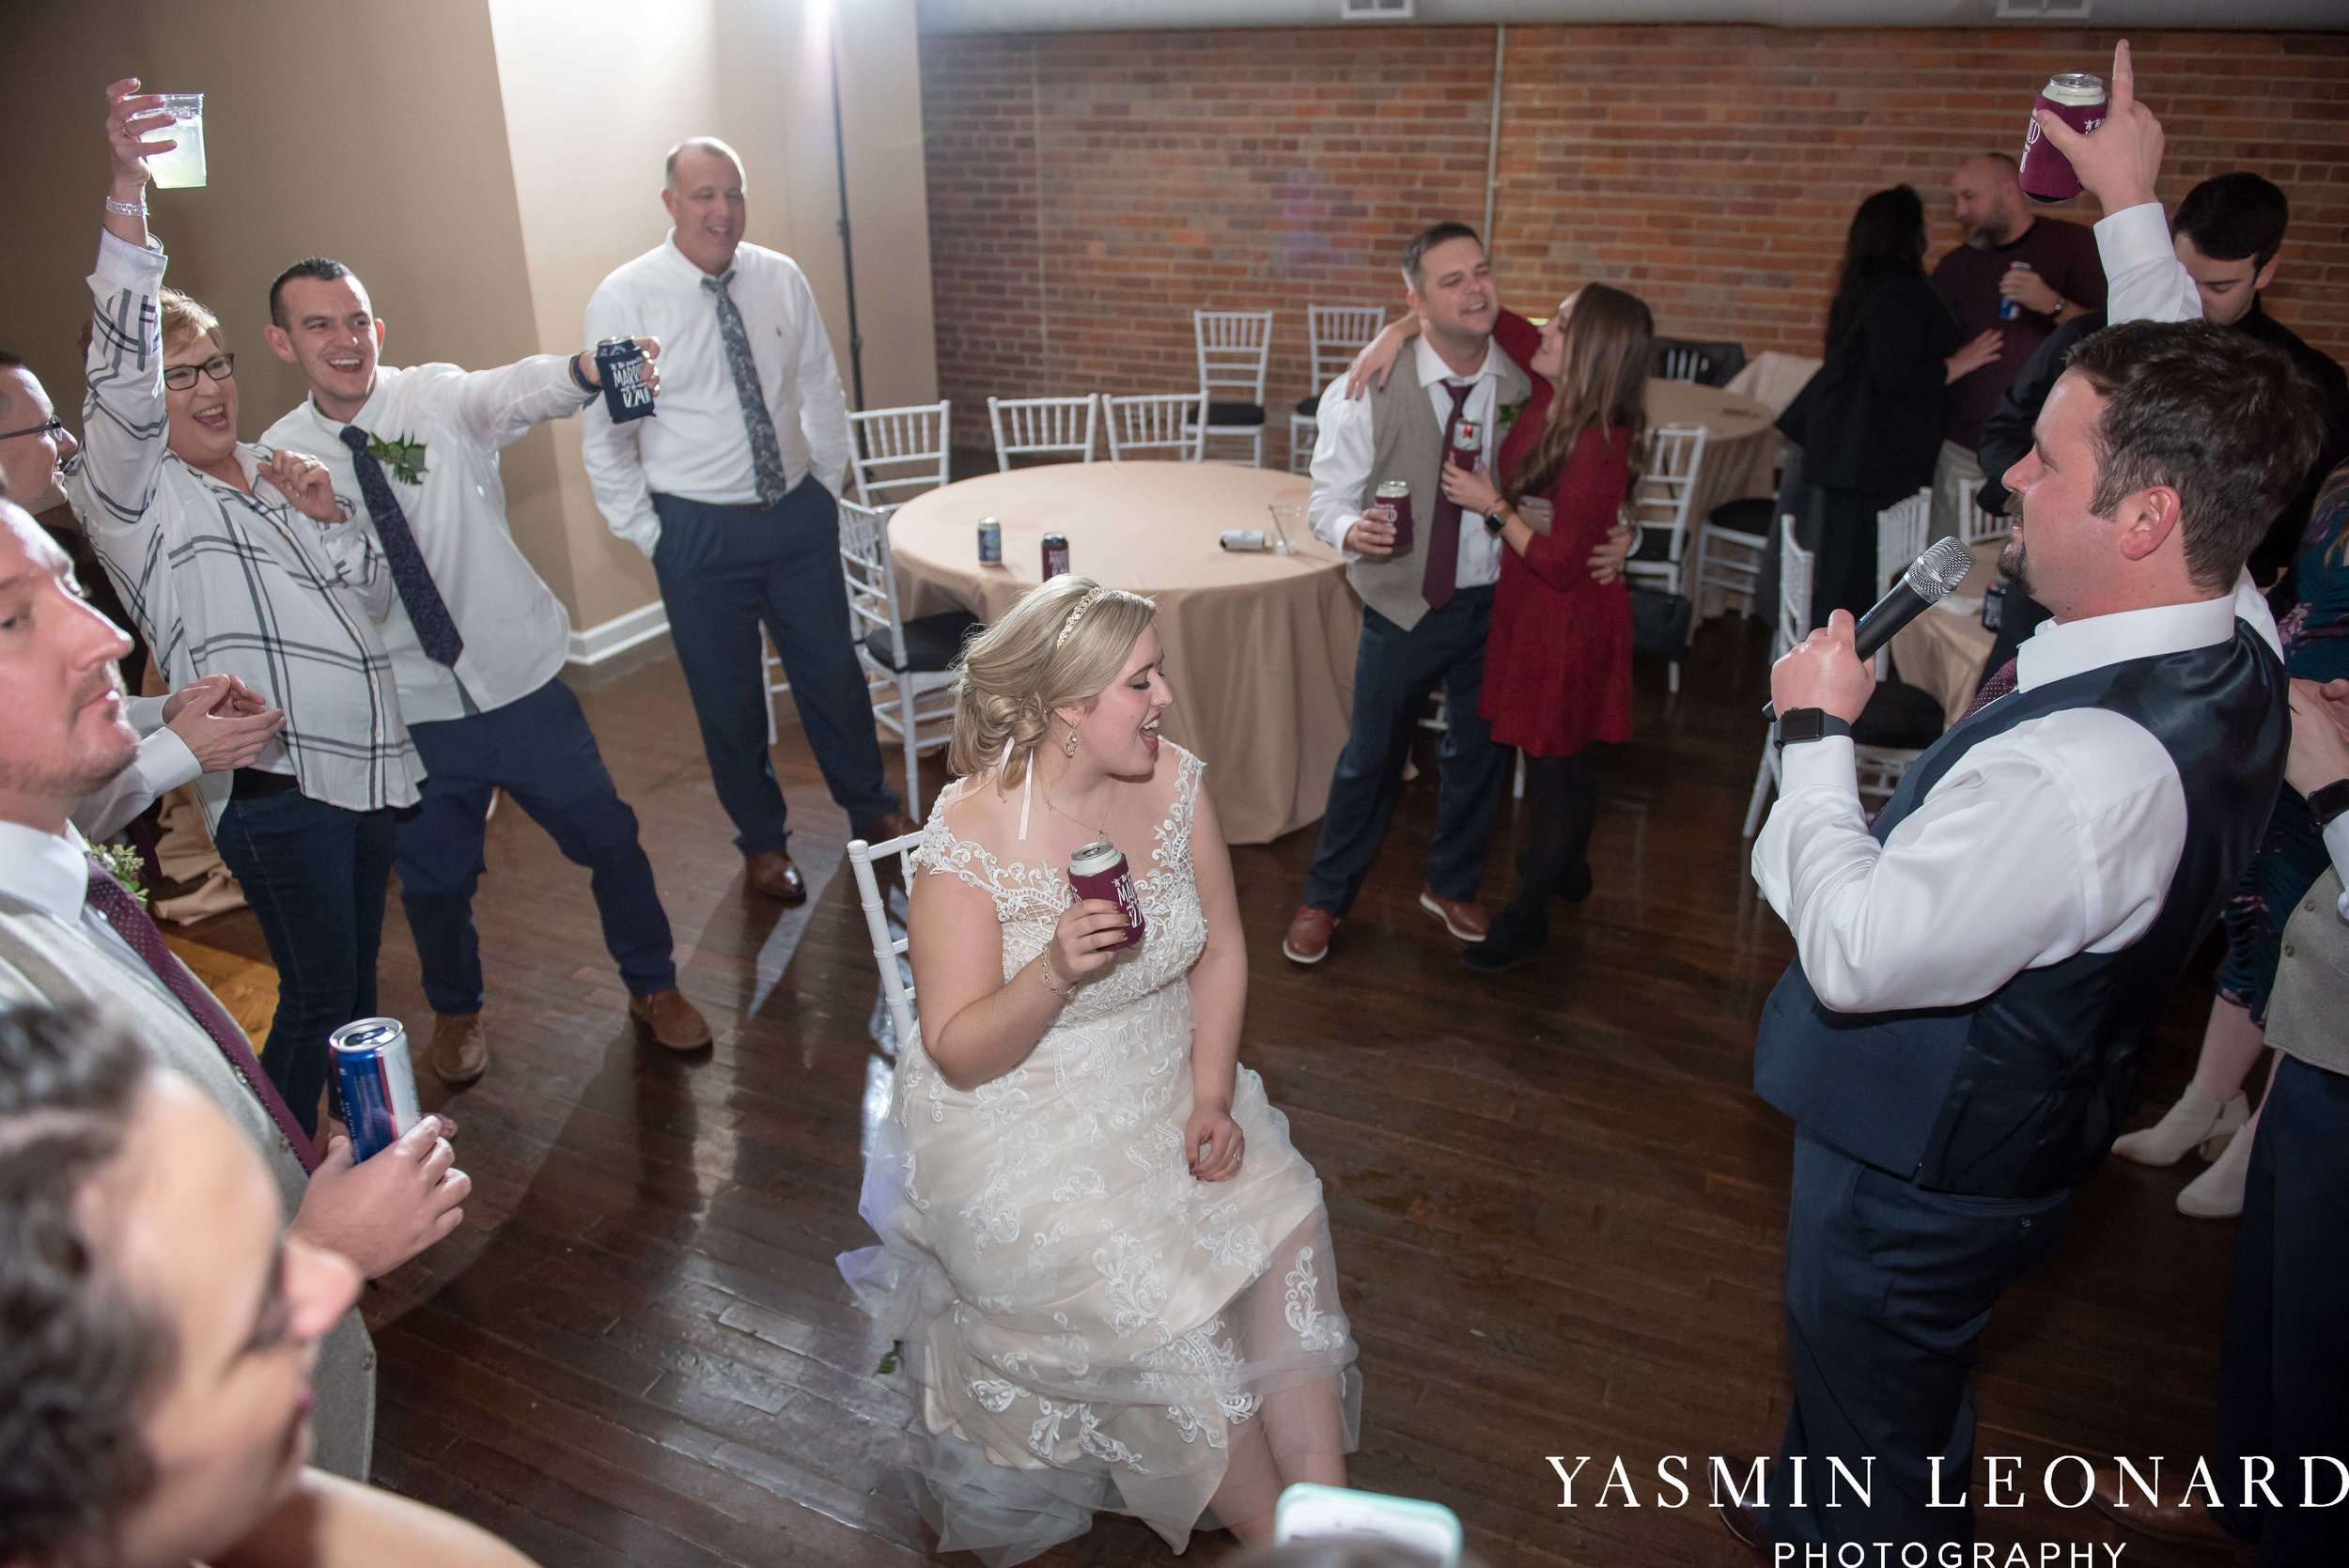 Rebekah and Matt - 105 Worth Event Centre - Yasmin Leonard Photography - Asheboro Wedding - NC Wedding - High Point Weddings - Triad Weddings - Winter Wedding-87.jpg